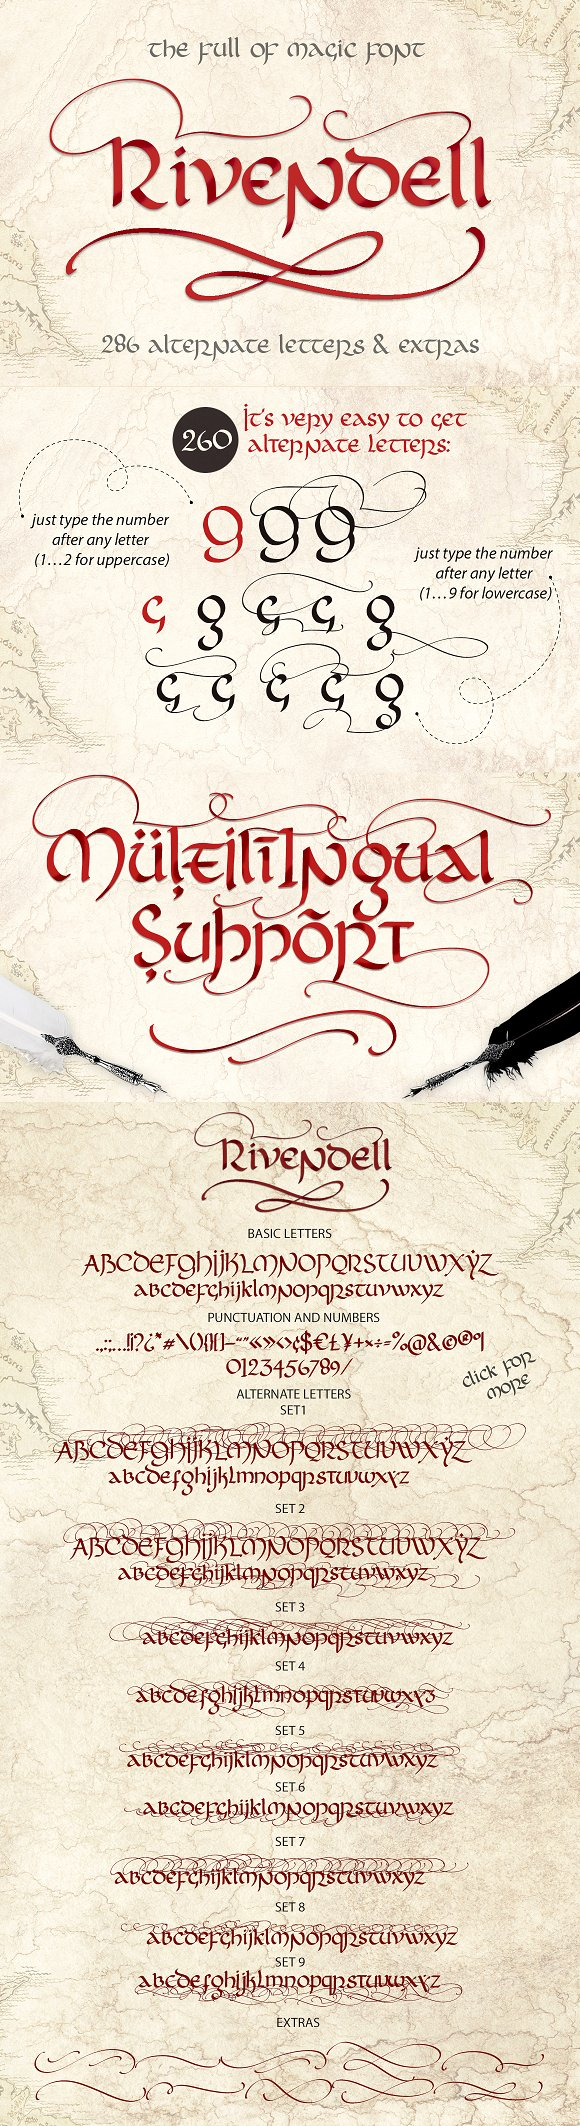 Rivendell. The full of magic font.